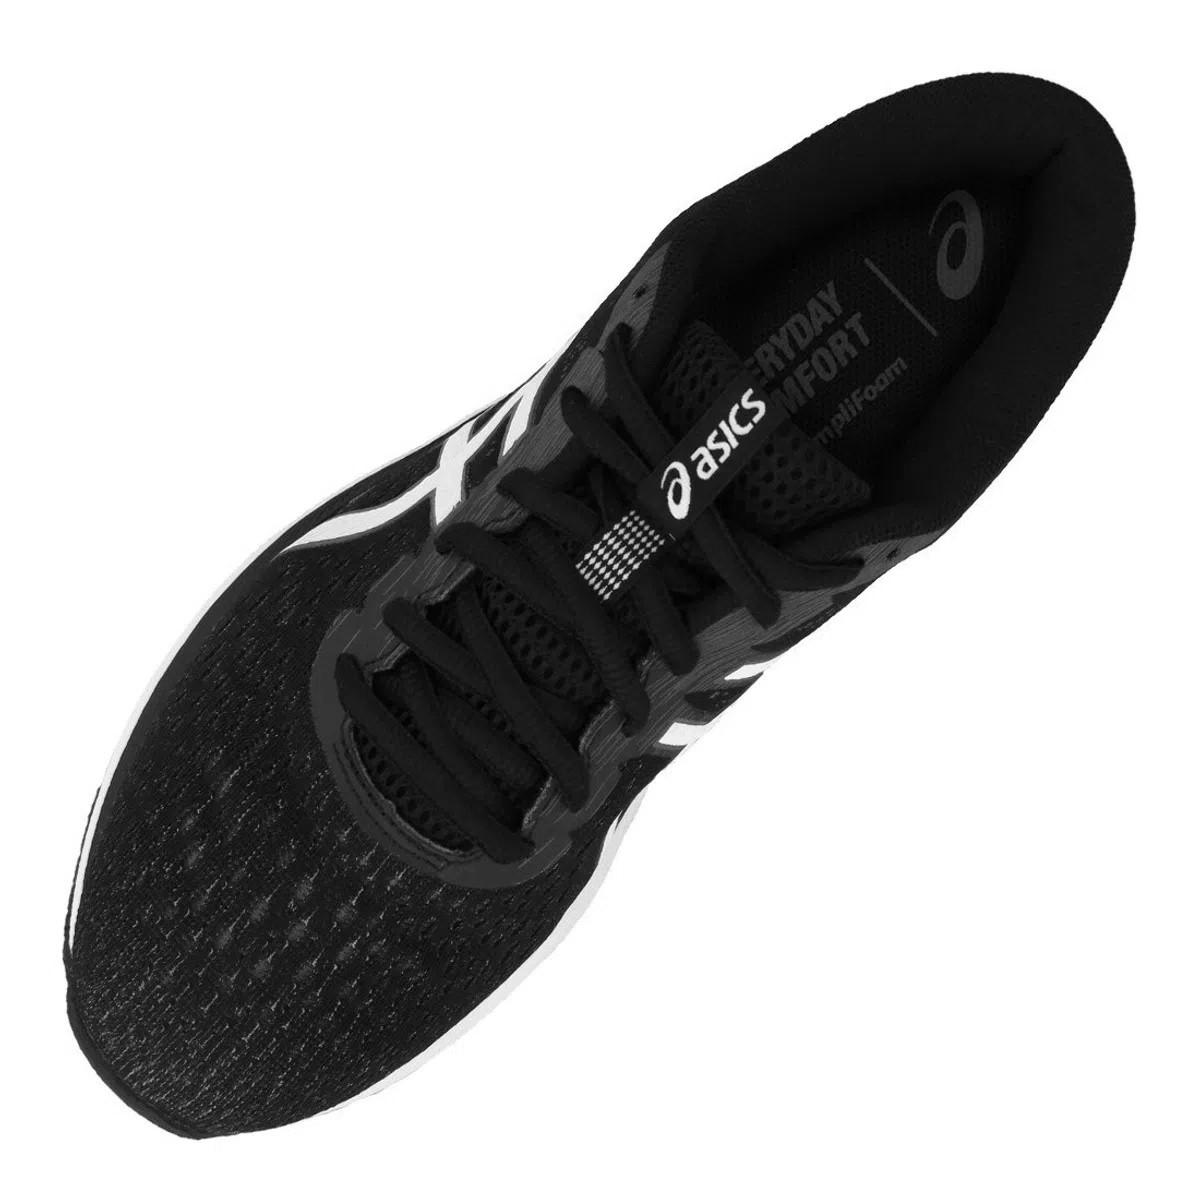 Tênis Asics Gel Excite 7 Masculino Preto e Branco